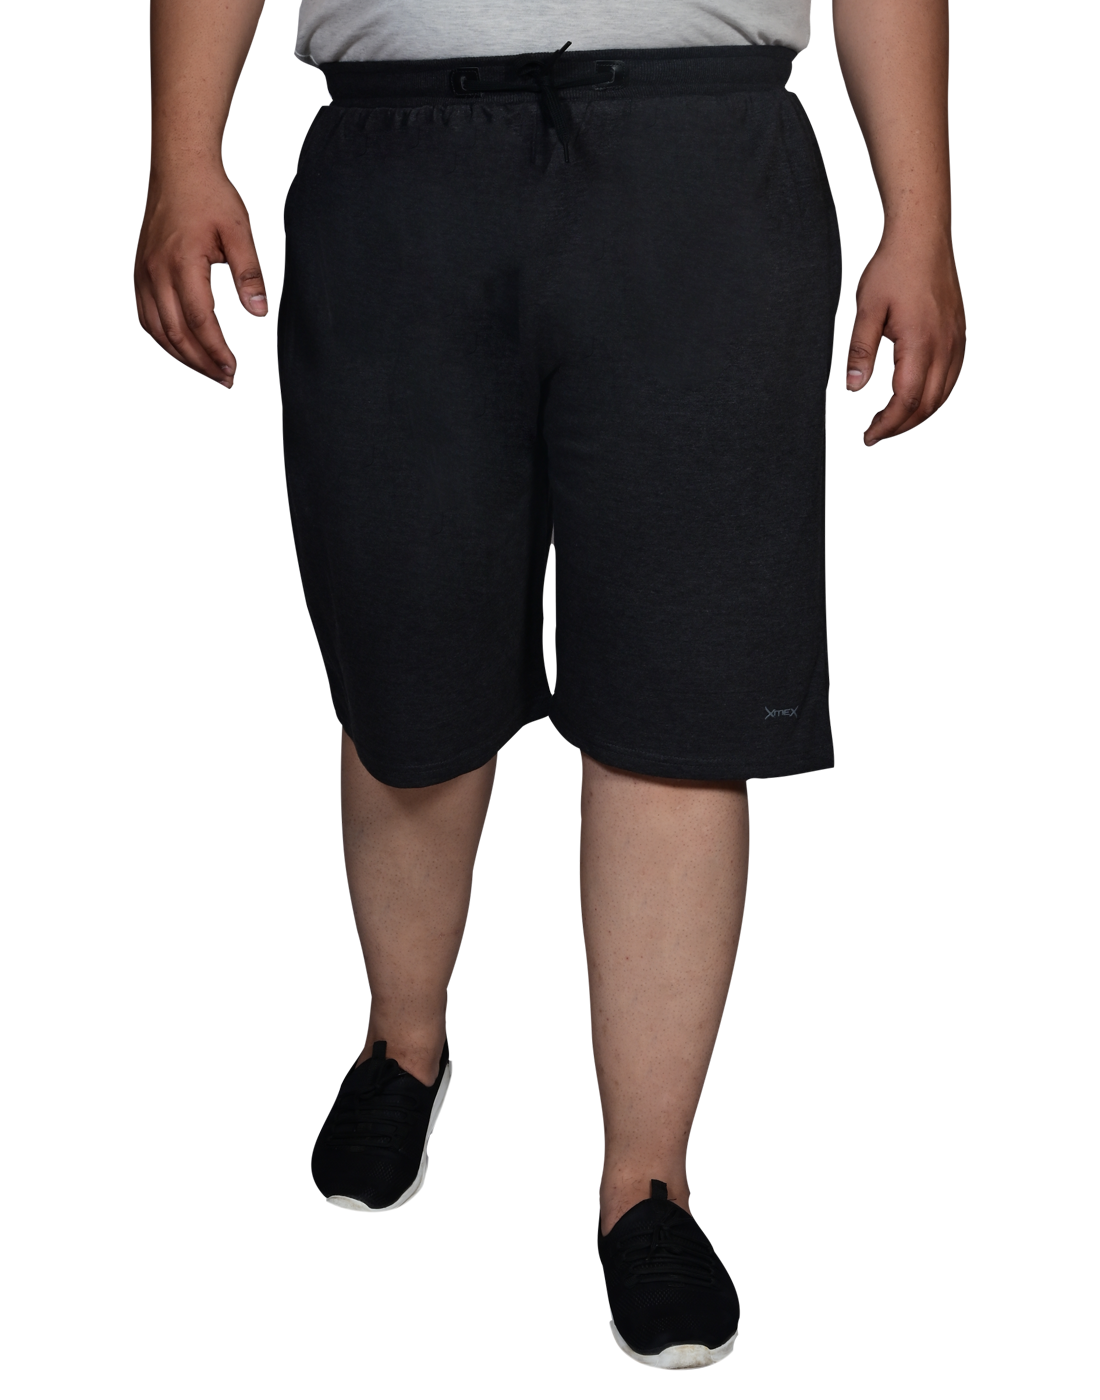 XMEX | Xmex Grey Plus Size Plain Hosiery Cotton Shorts with Zipped Pockets for Men